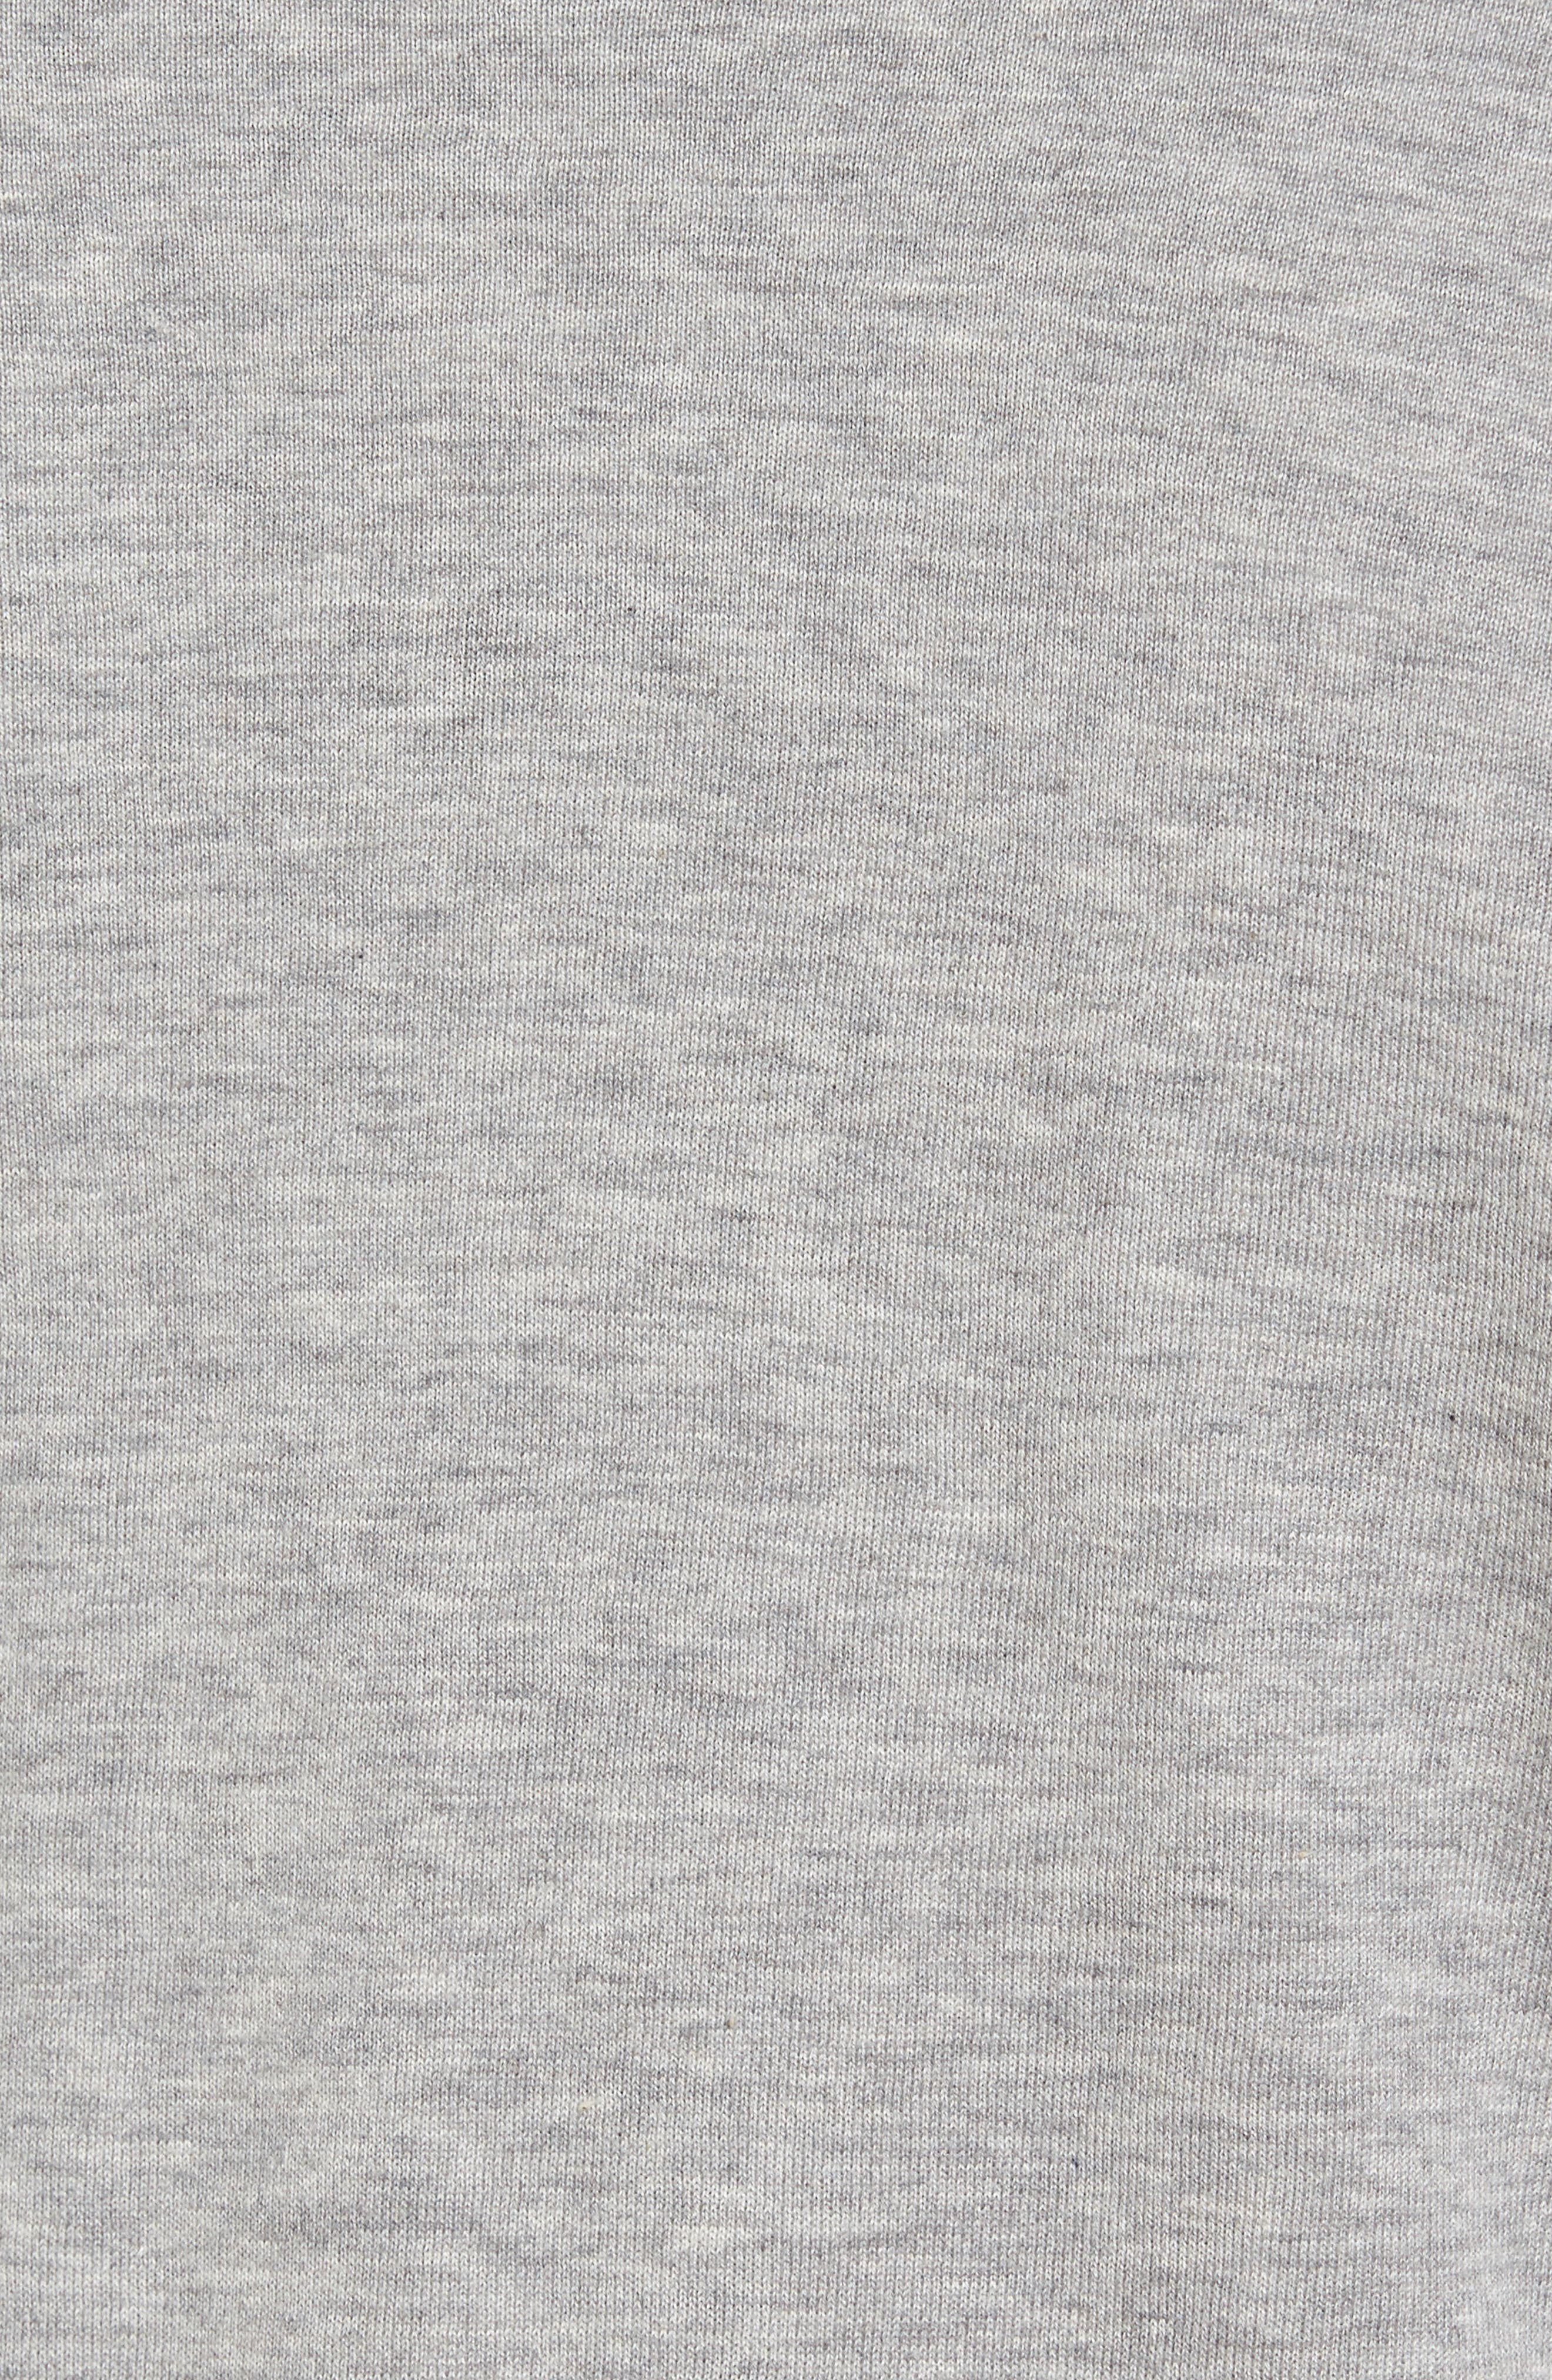 Mock Neck Zip Sweatshirt,                             Alternate thumbnail 5, color,                             Heather Grey/ Platinum